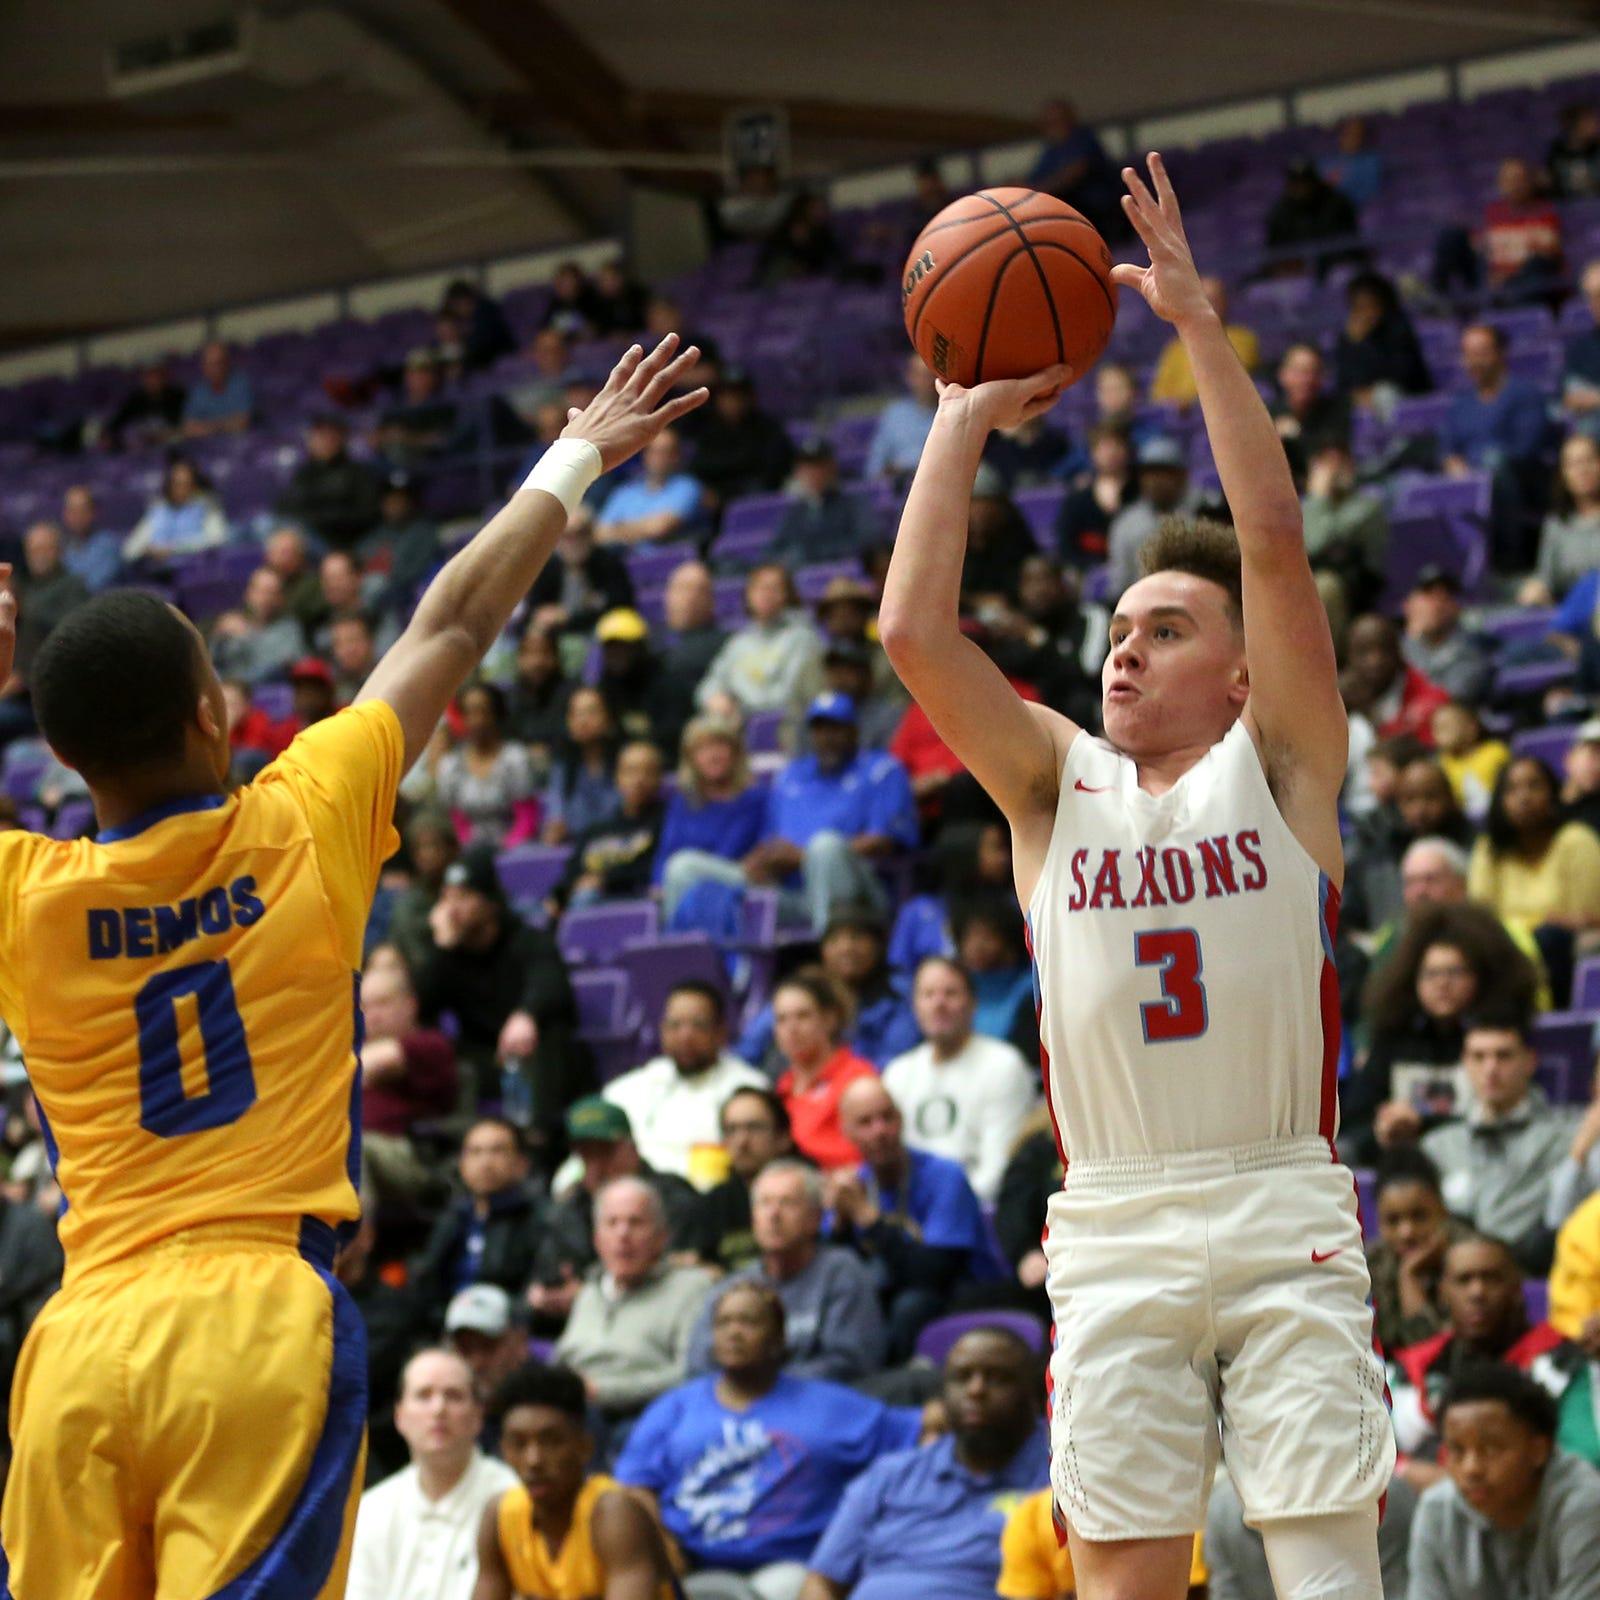 OSAA roundup: South Salem, Silverton, Stayton, Woodburn boys fall in semifinals